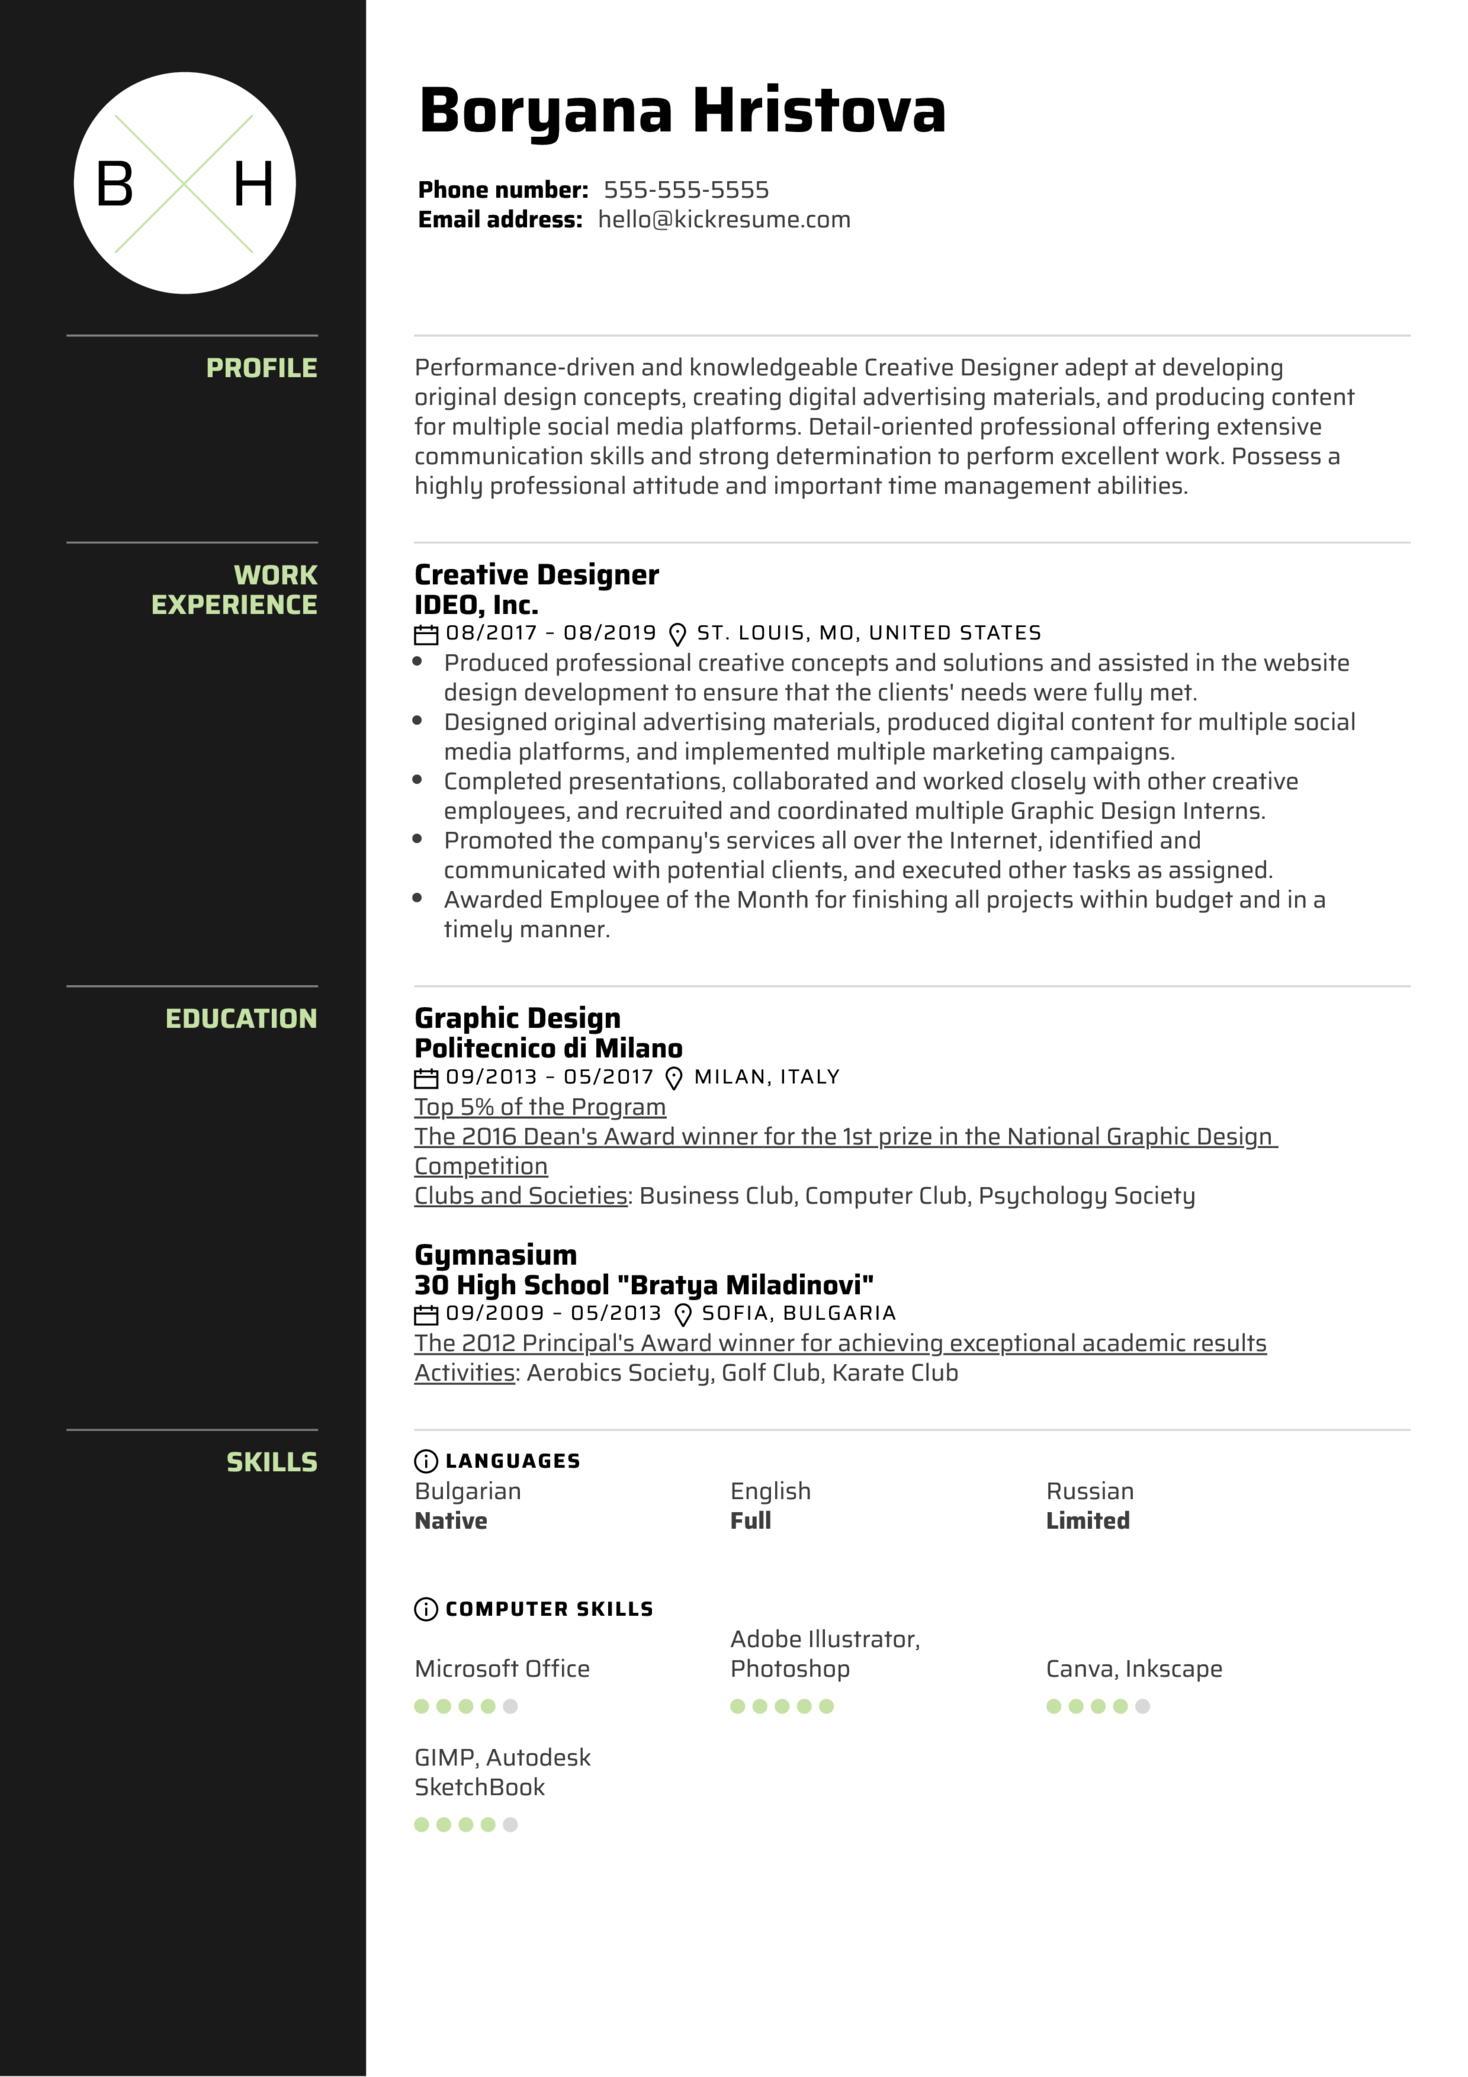 Creative Designer Resume Template (parte 1)